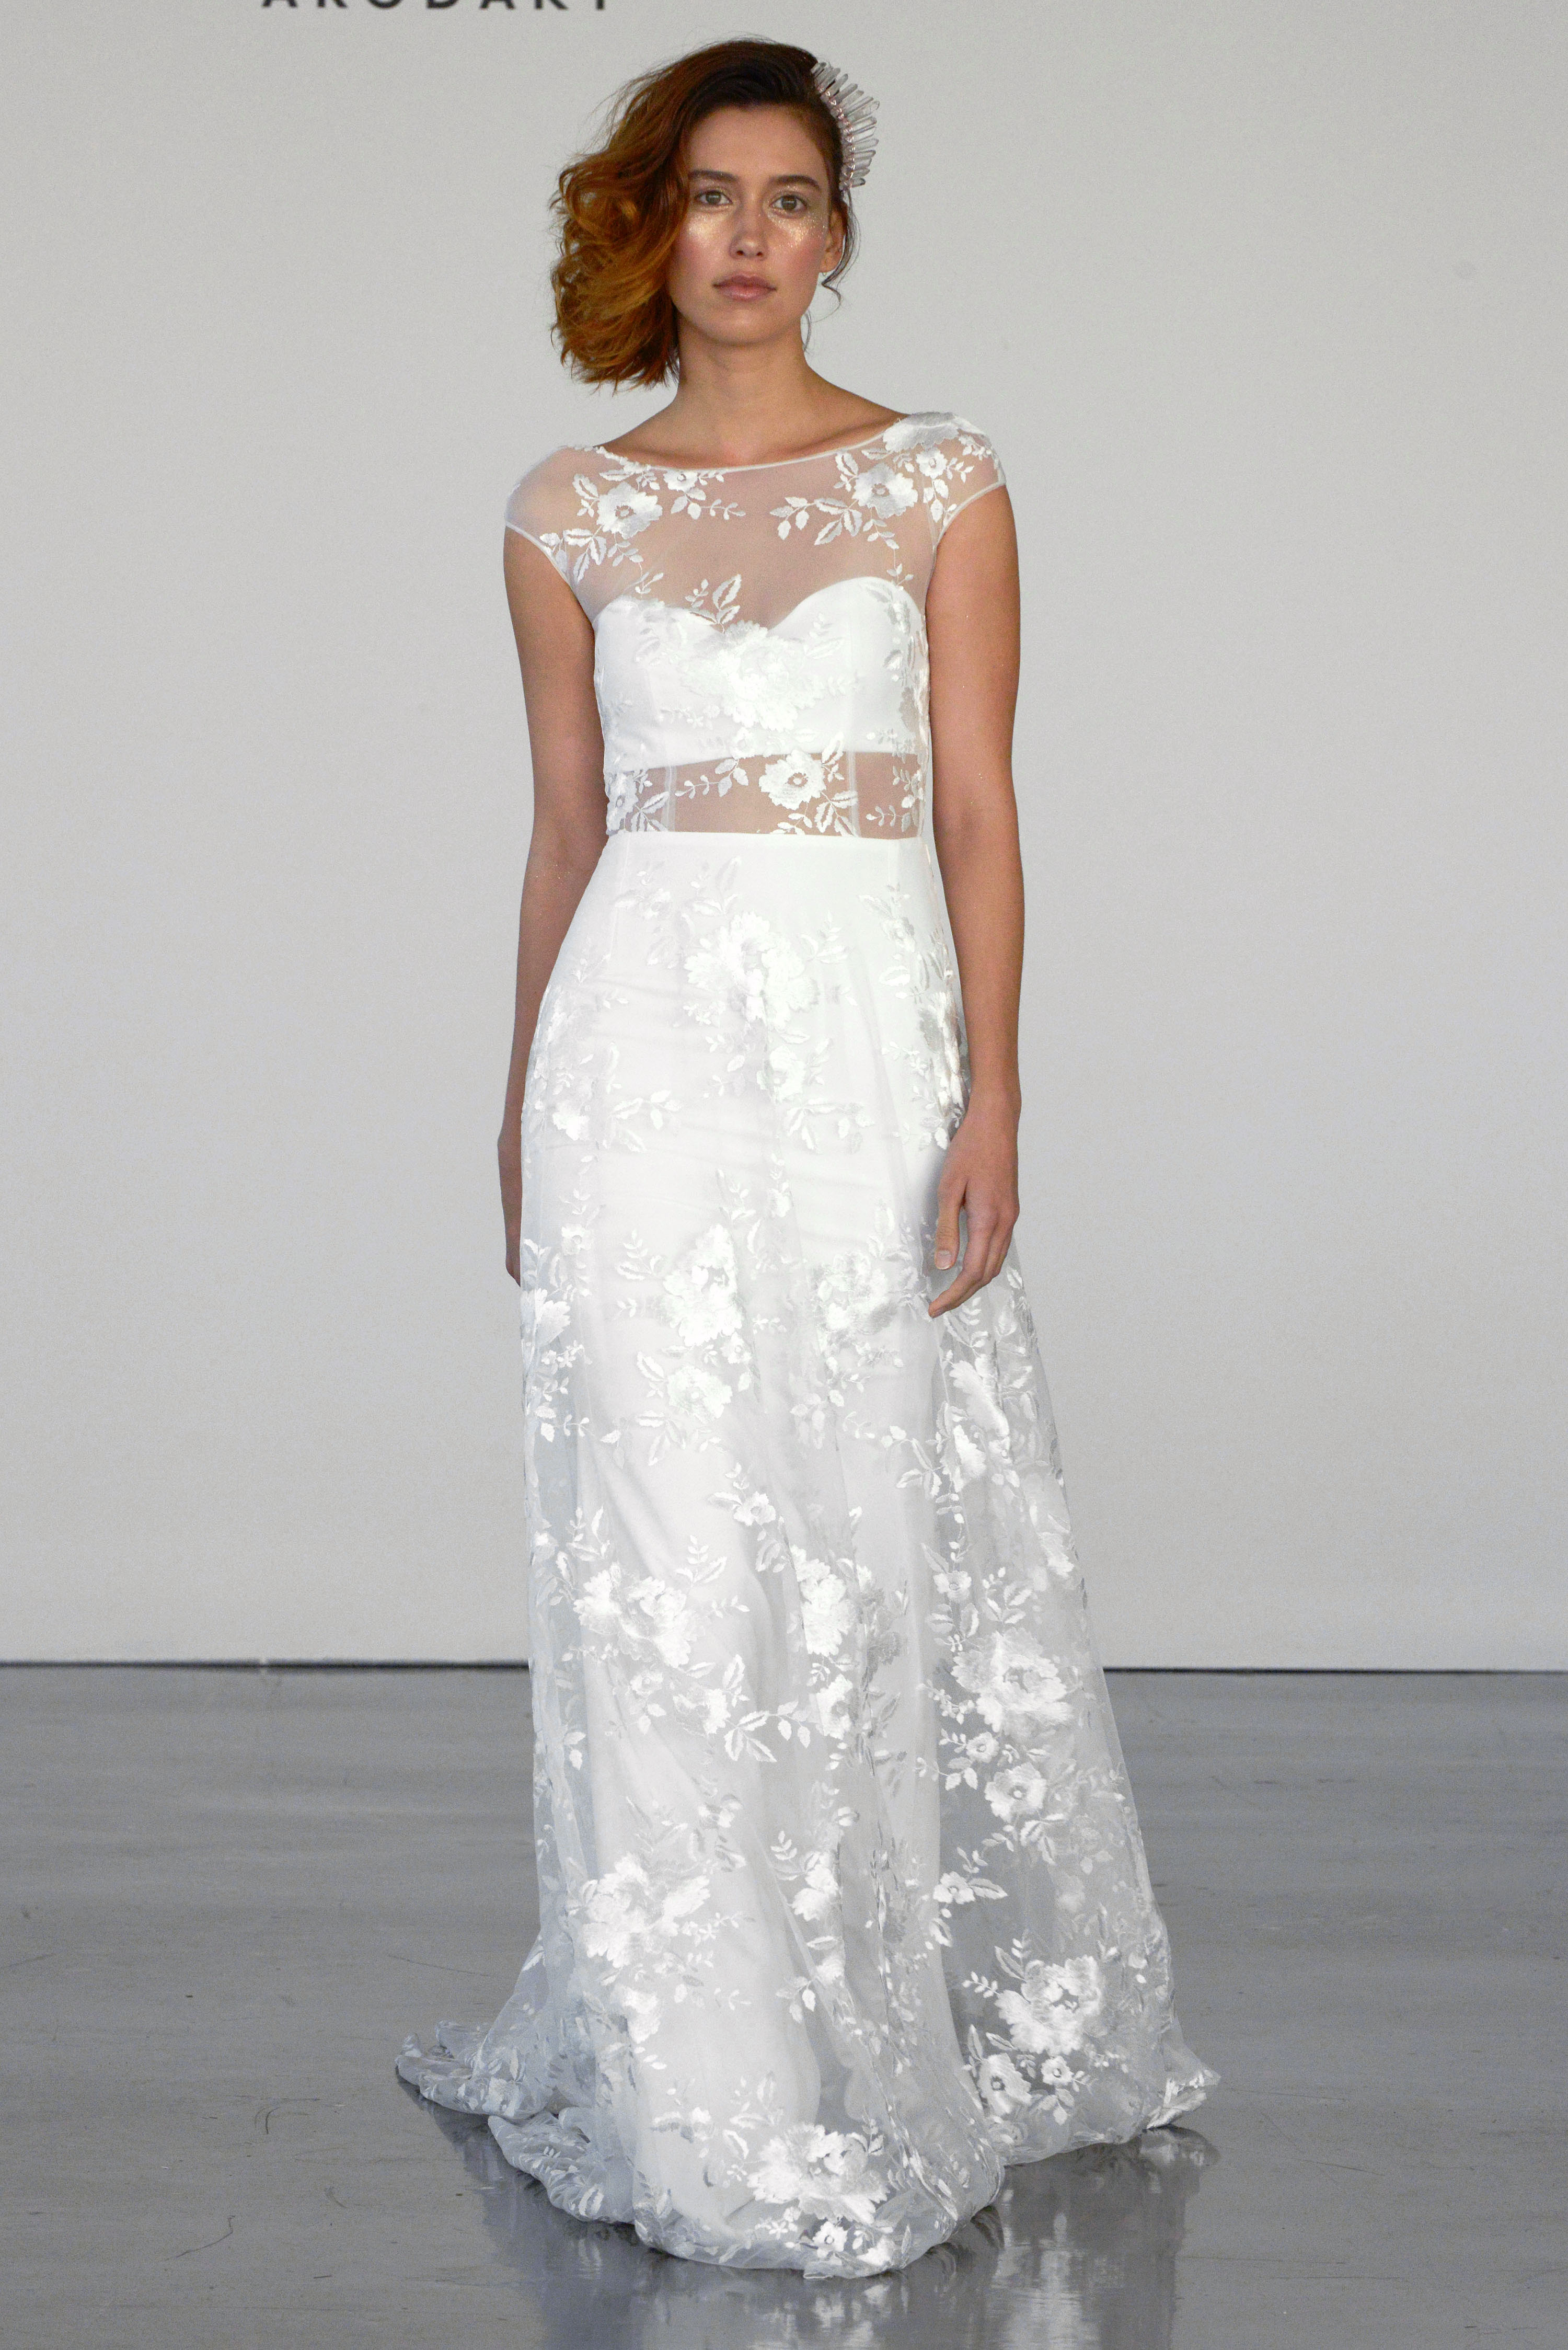 Rime Arodaky wedding dress 23 Fall 2017